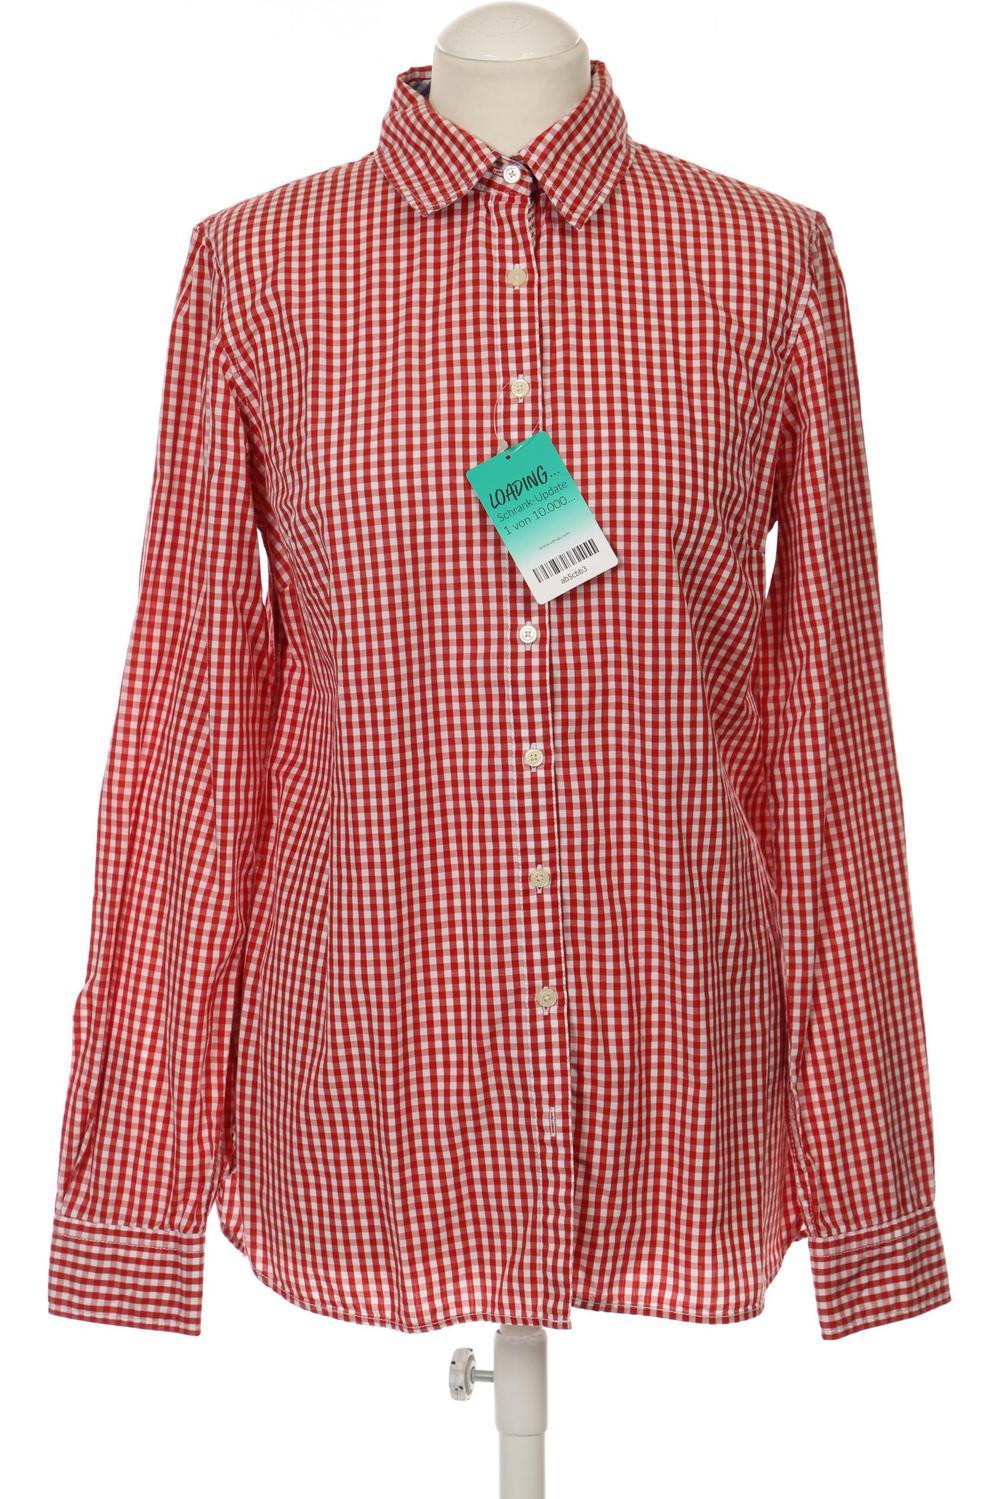 Tommy Hilfiger Damen Bluse Hemd rot Größe XXL